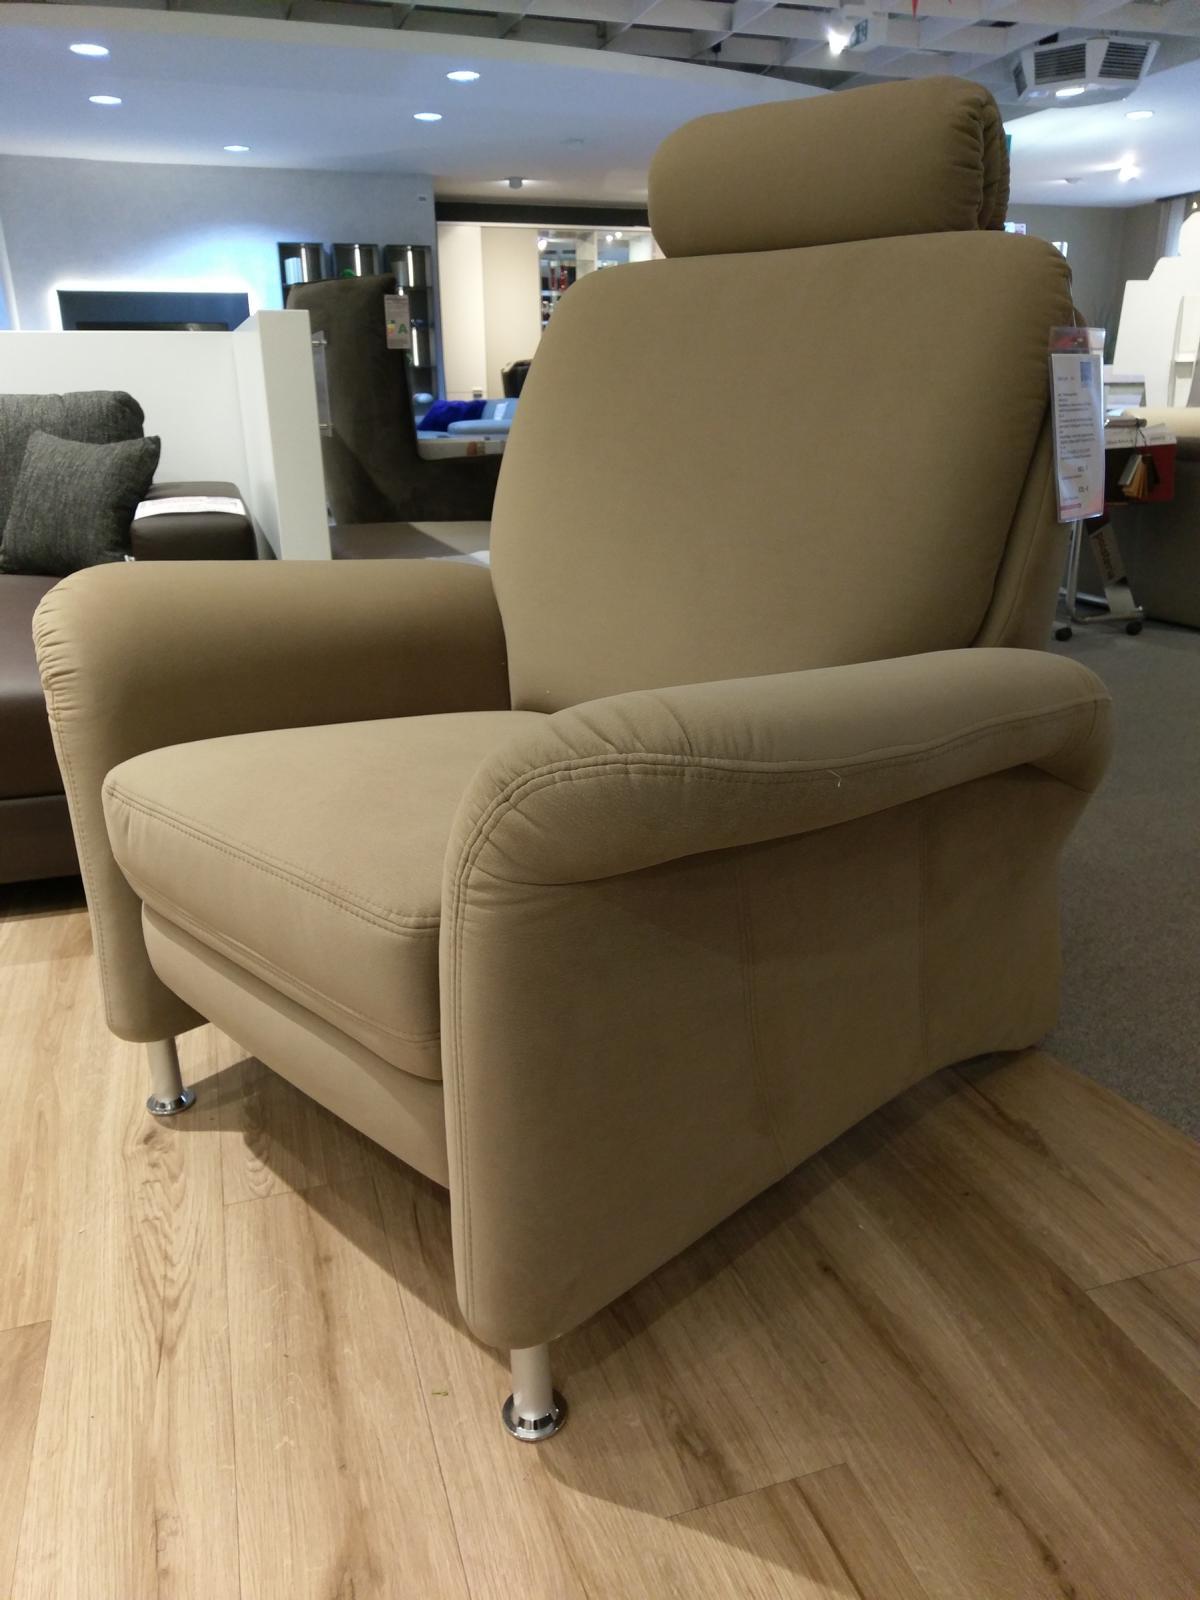 tv sessel relaxsessel jackson s von zehdenick super angebot ebay. Black Bedroom Furniture Sets. Home Design Ideas